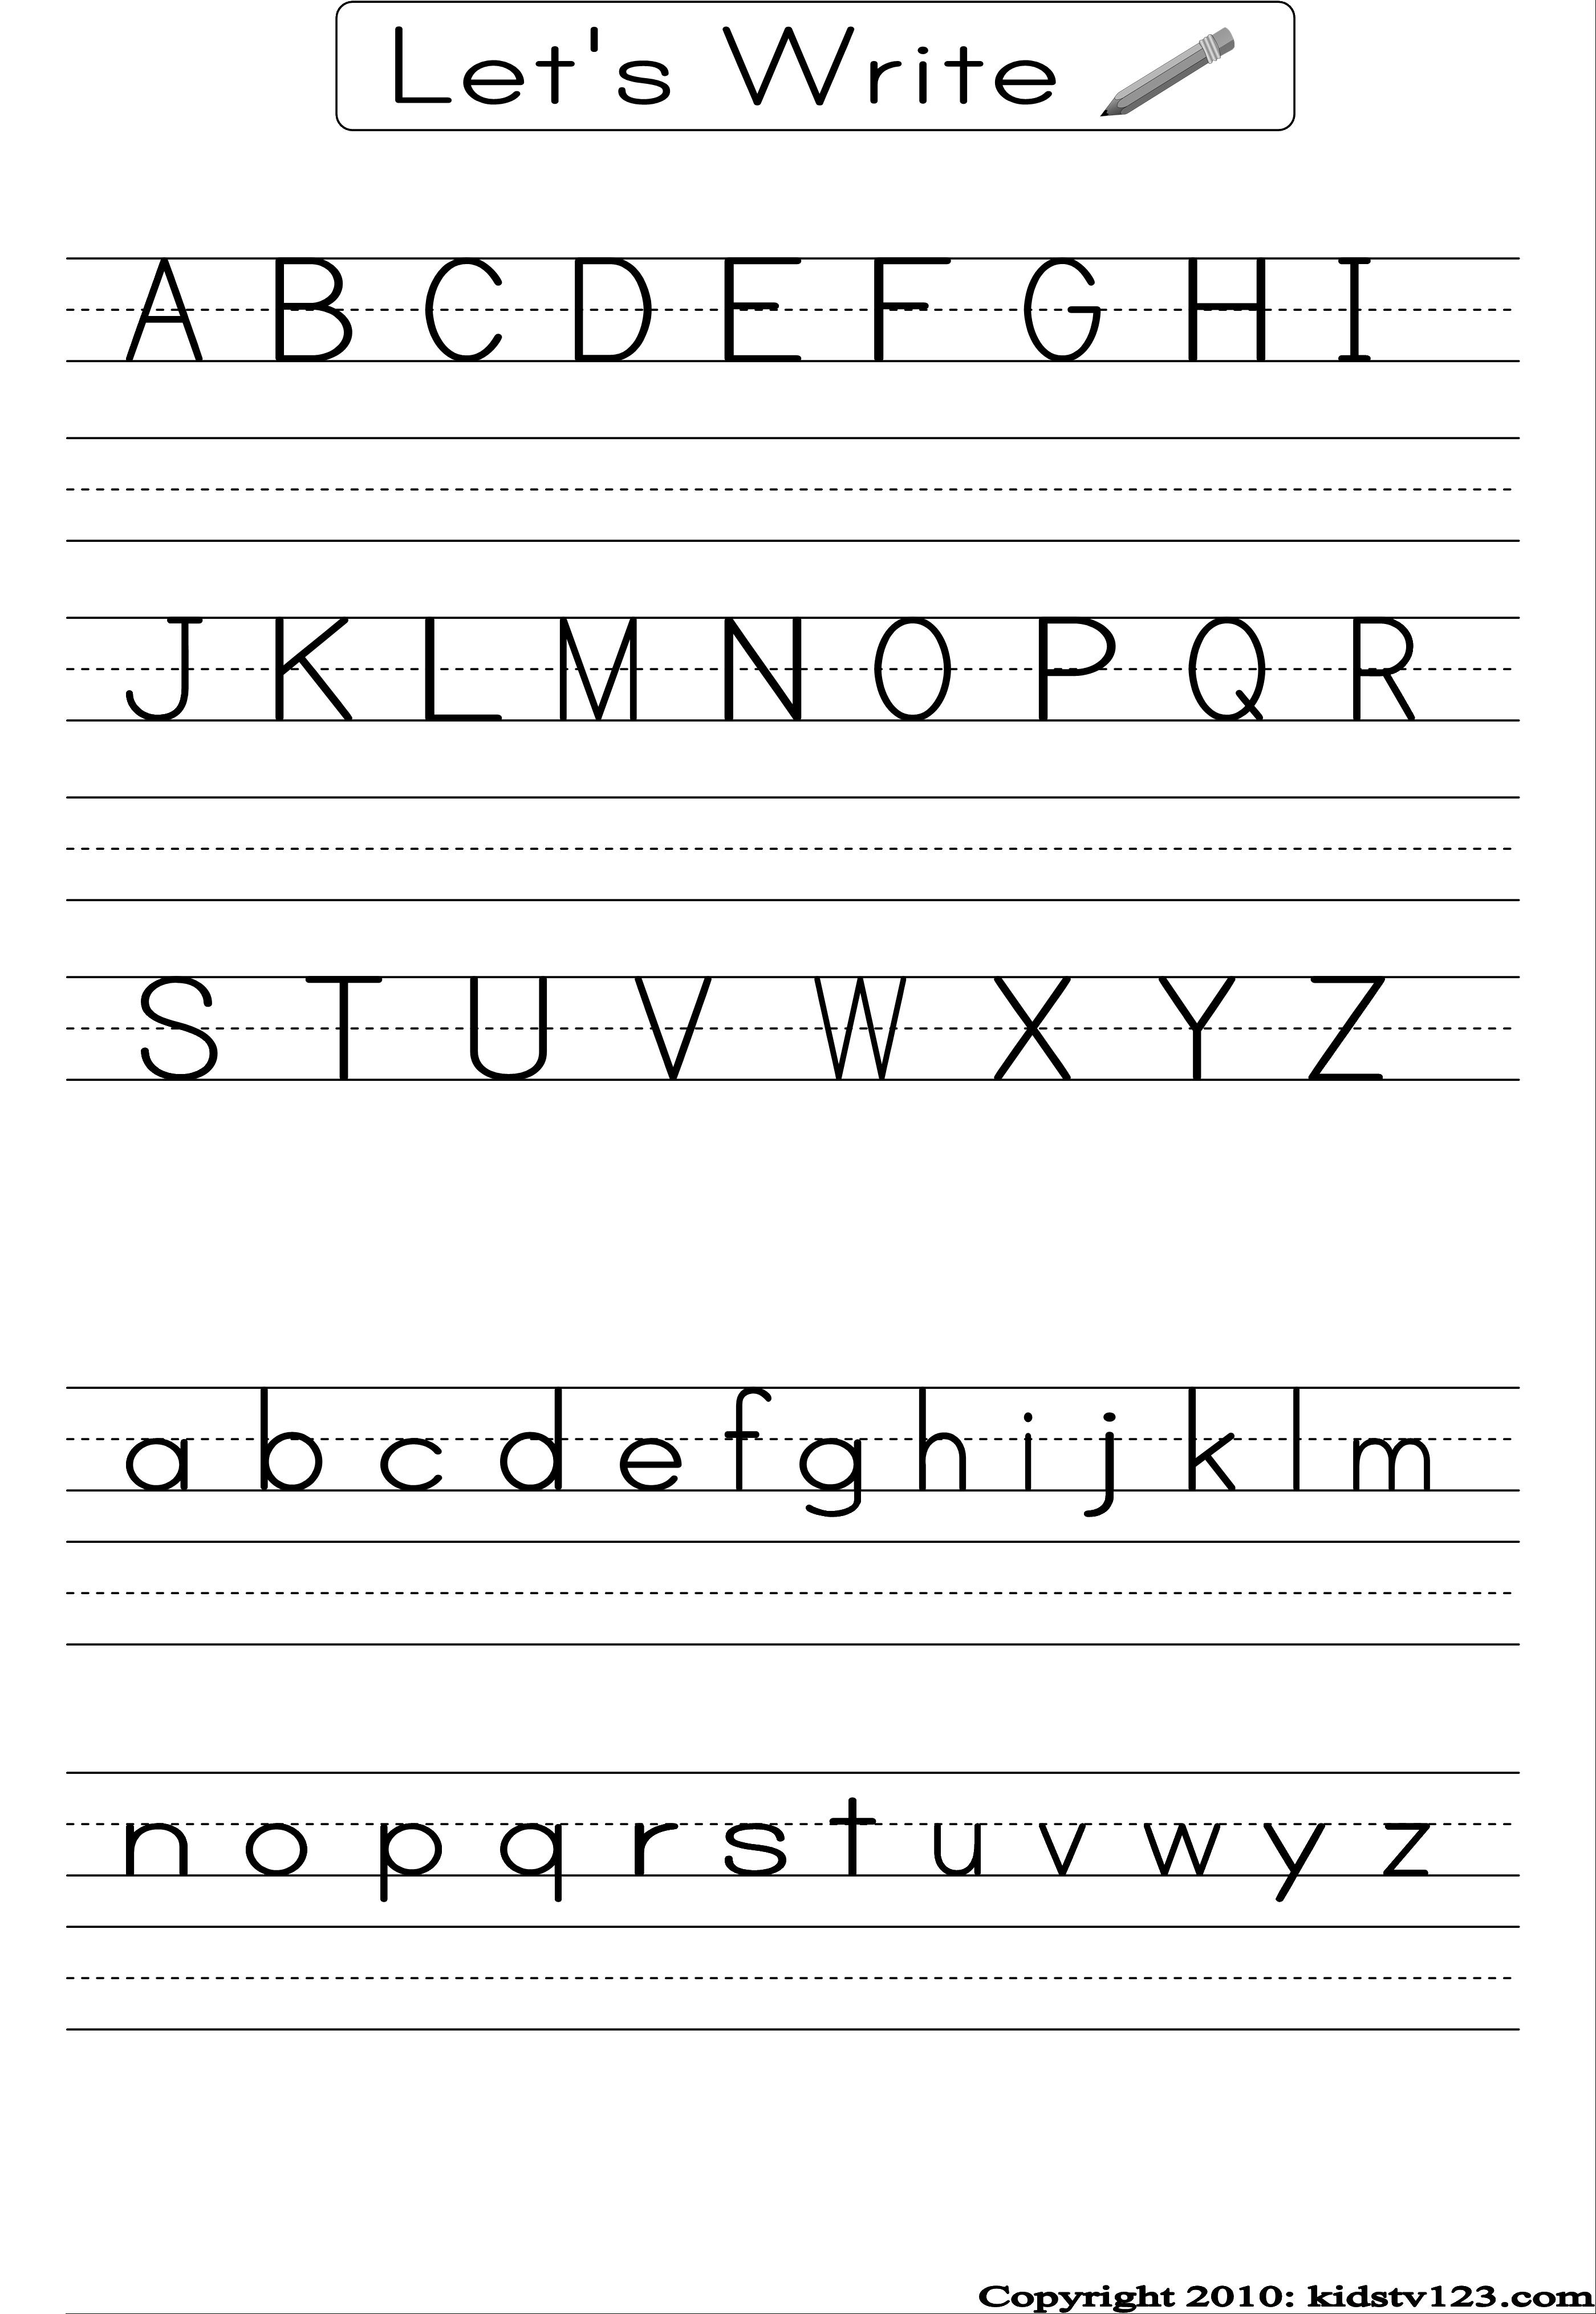 Alphabet Writing Practice Sheet | Edu-Fun | Alphabet Worksheets | Free Printable Letter Practice Worksheets